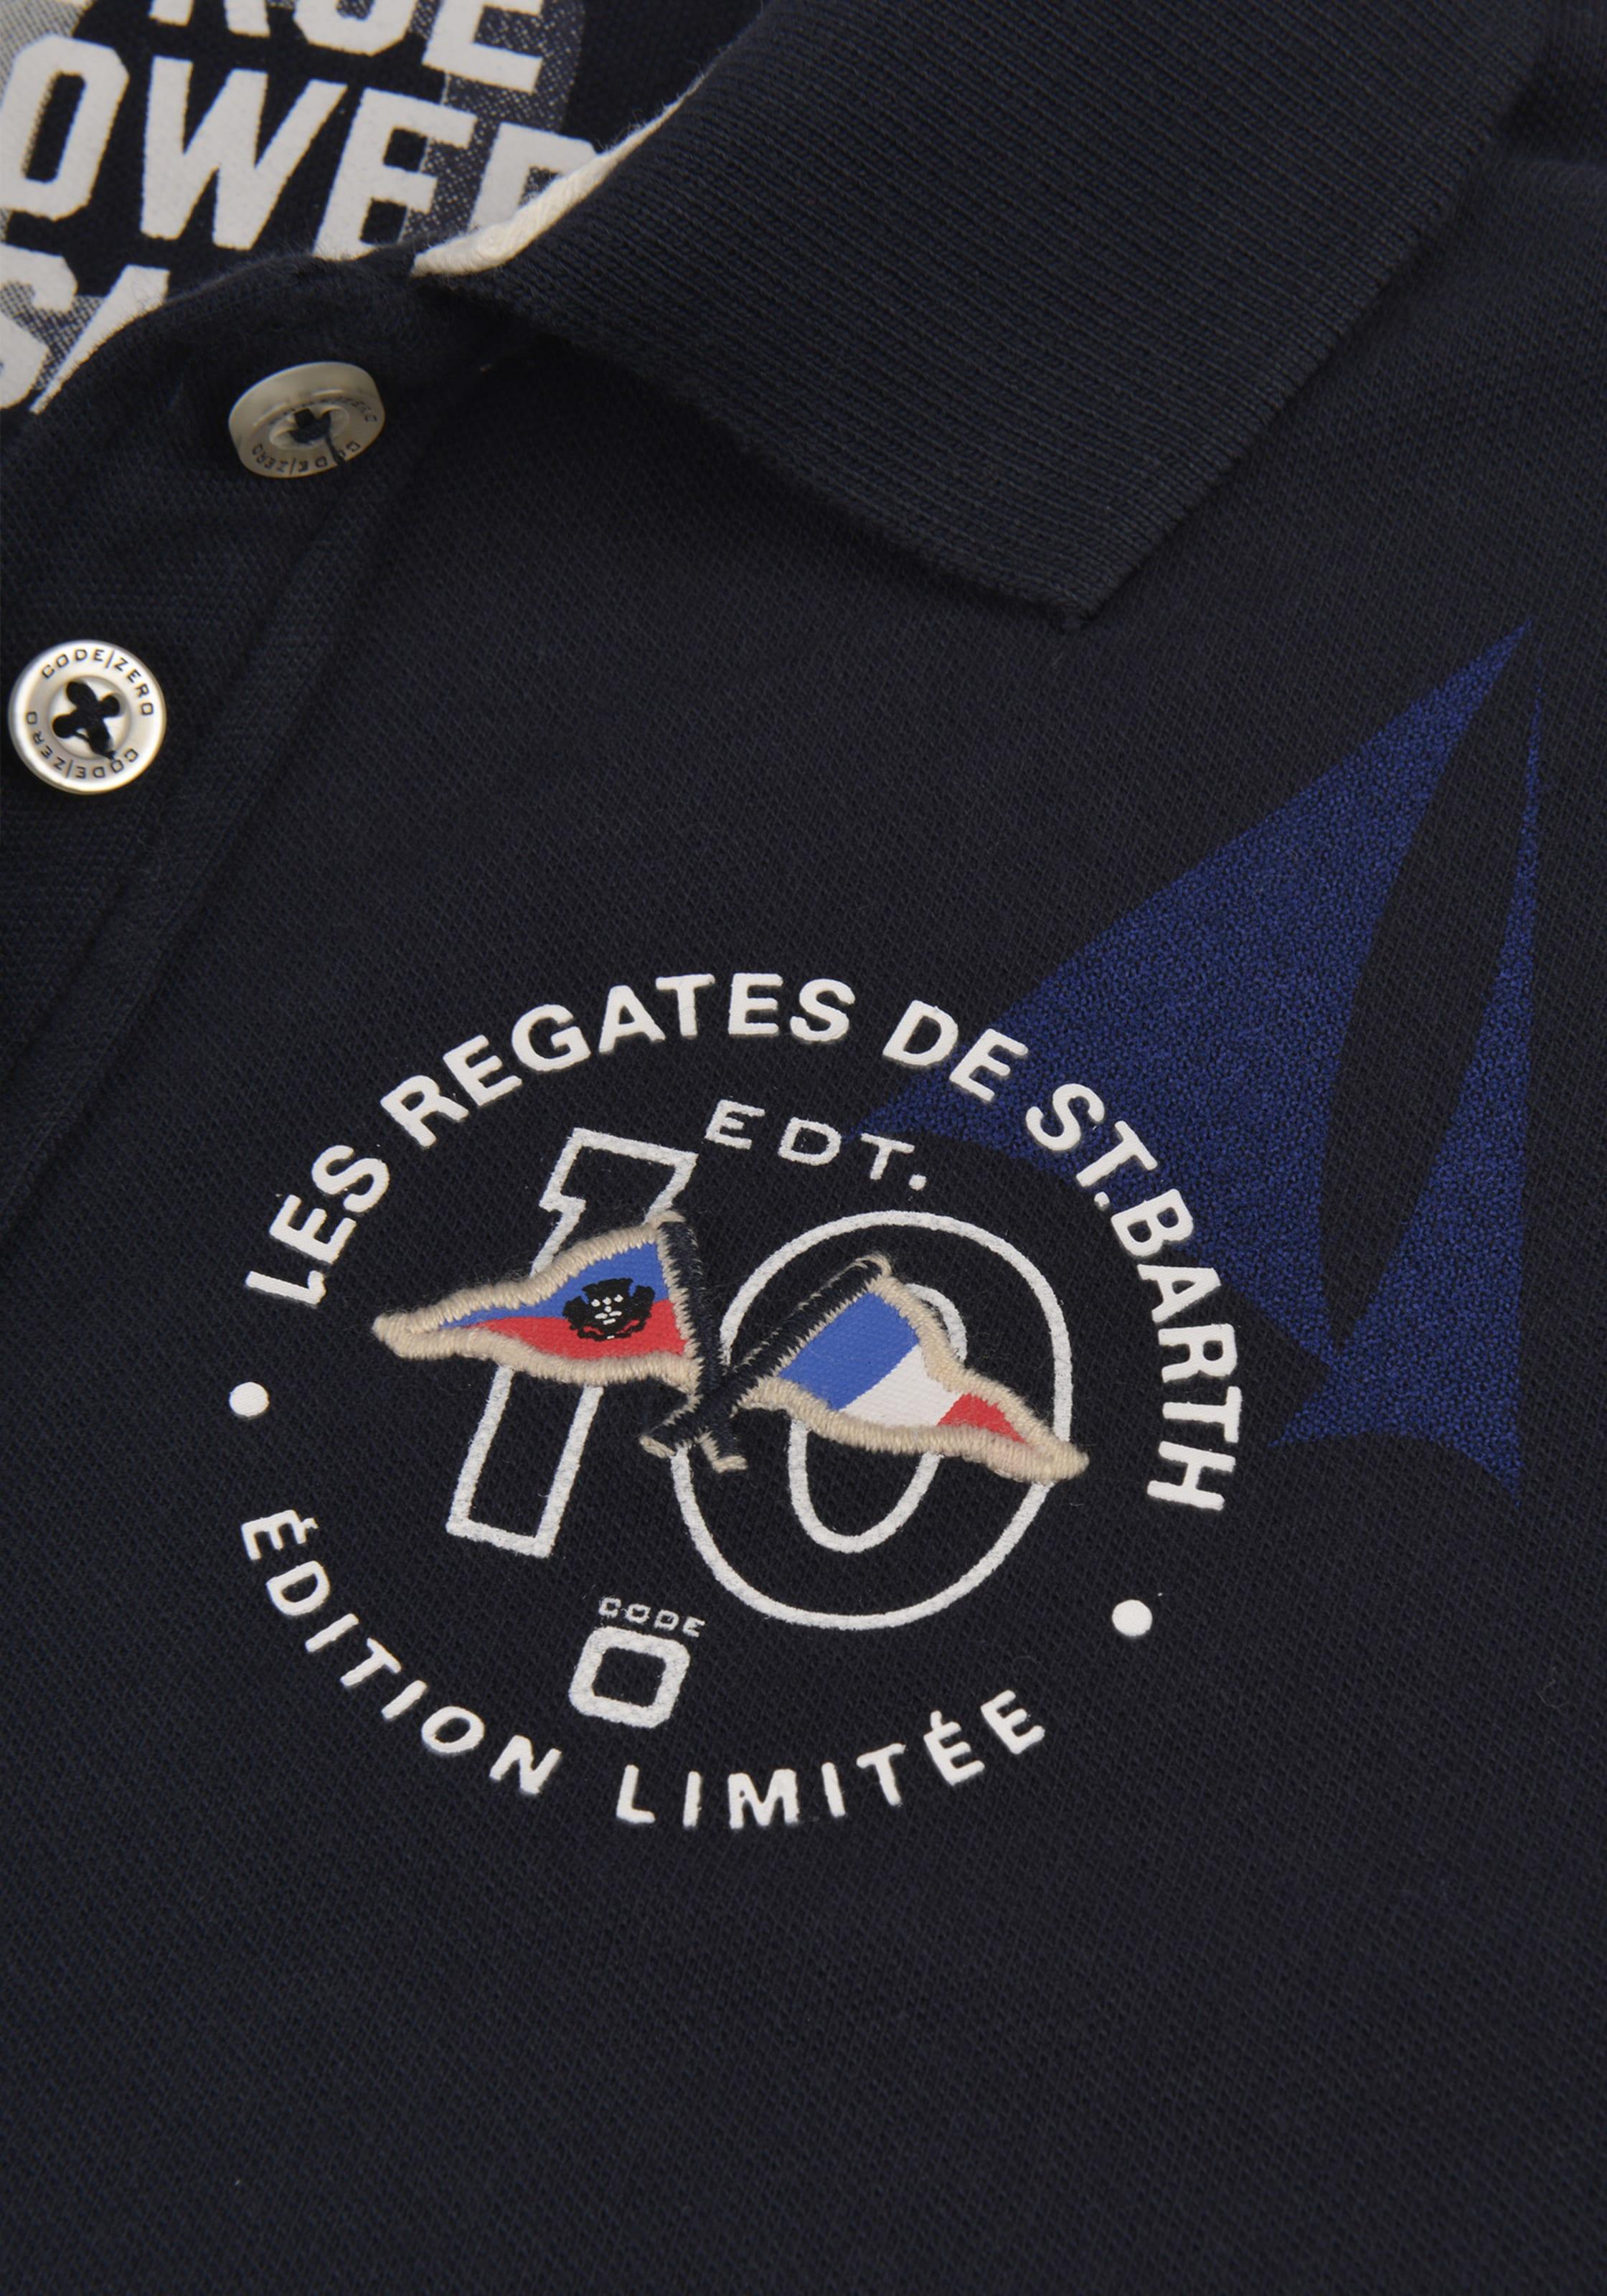 zero 'ss Navy Barthelemy' Code Polo In SVpqUMjGLz